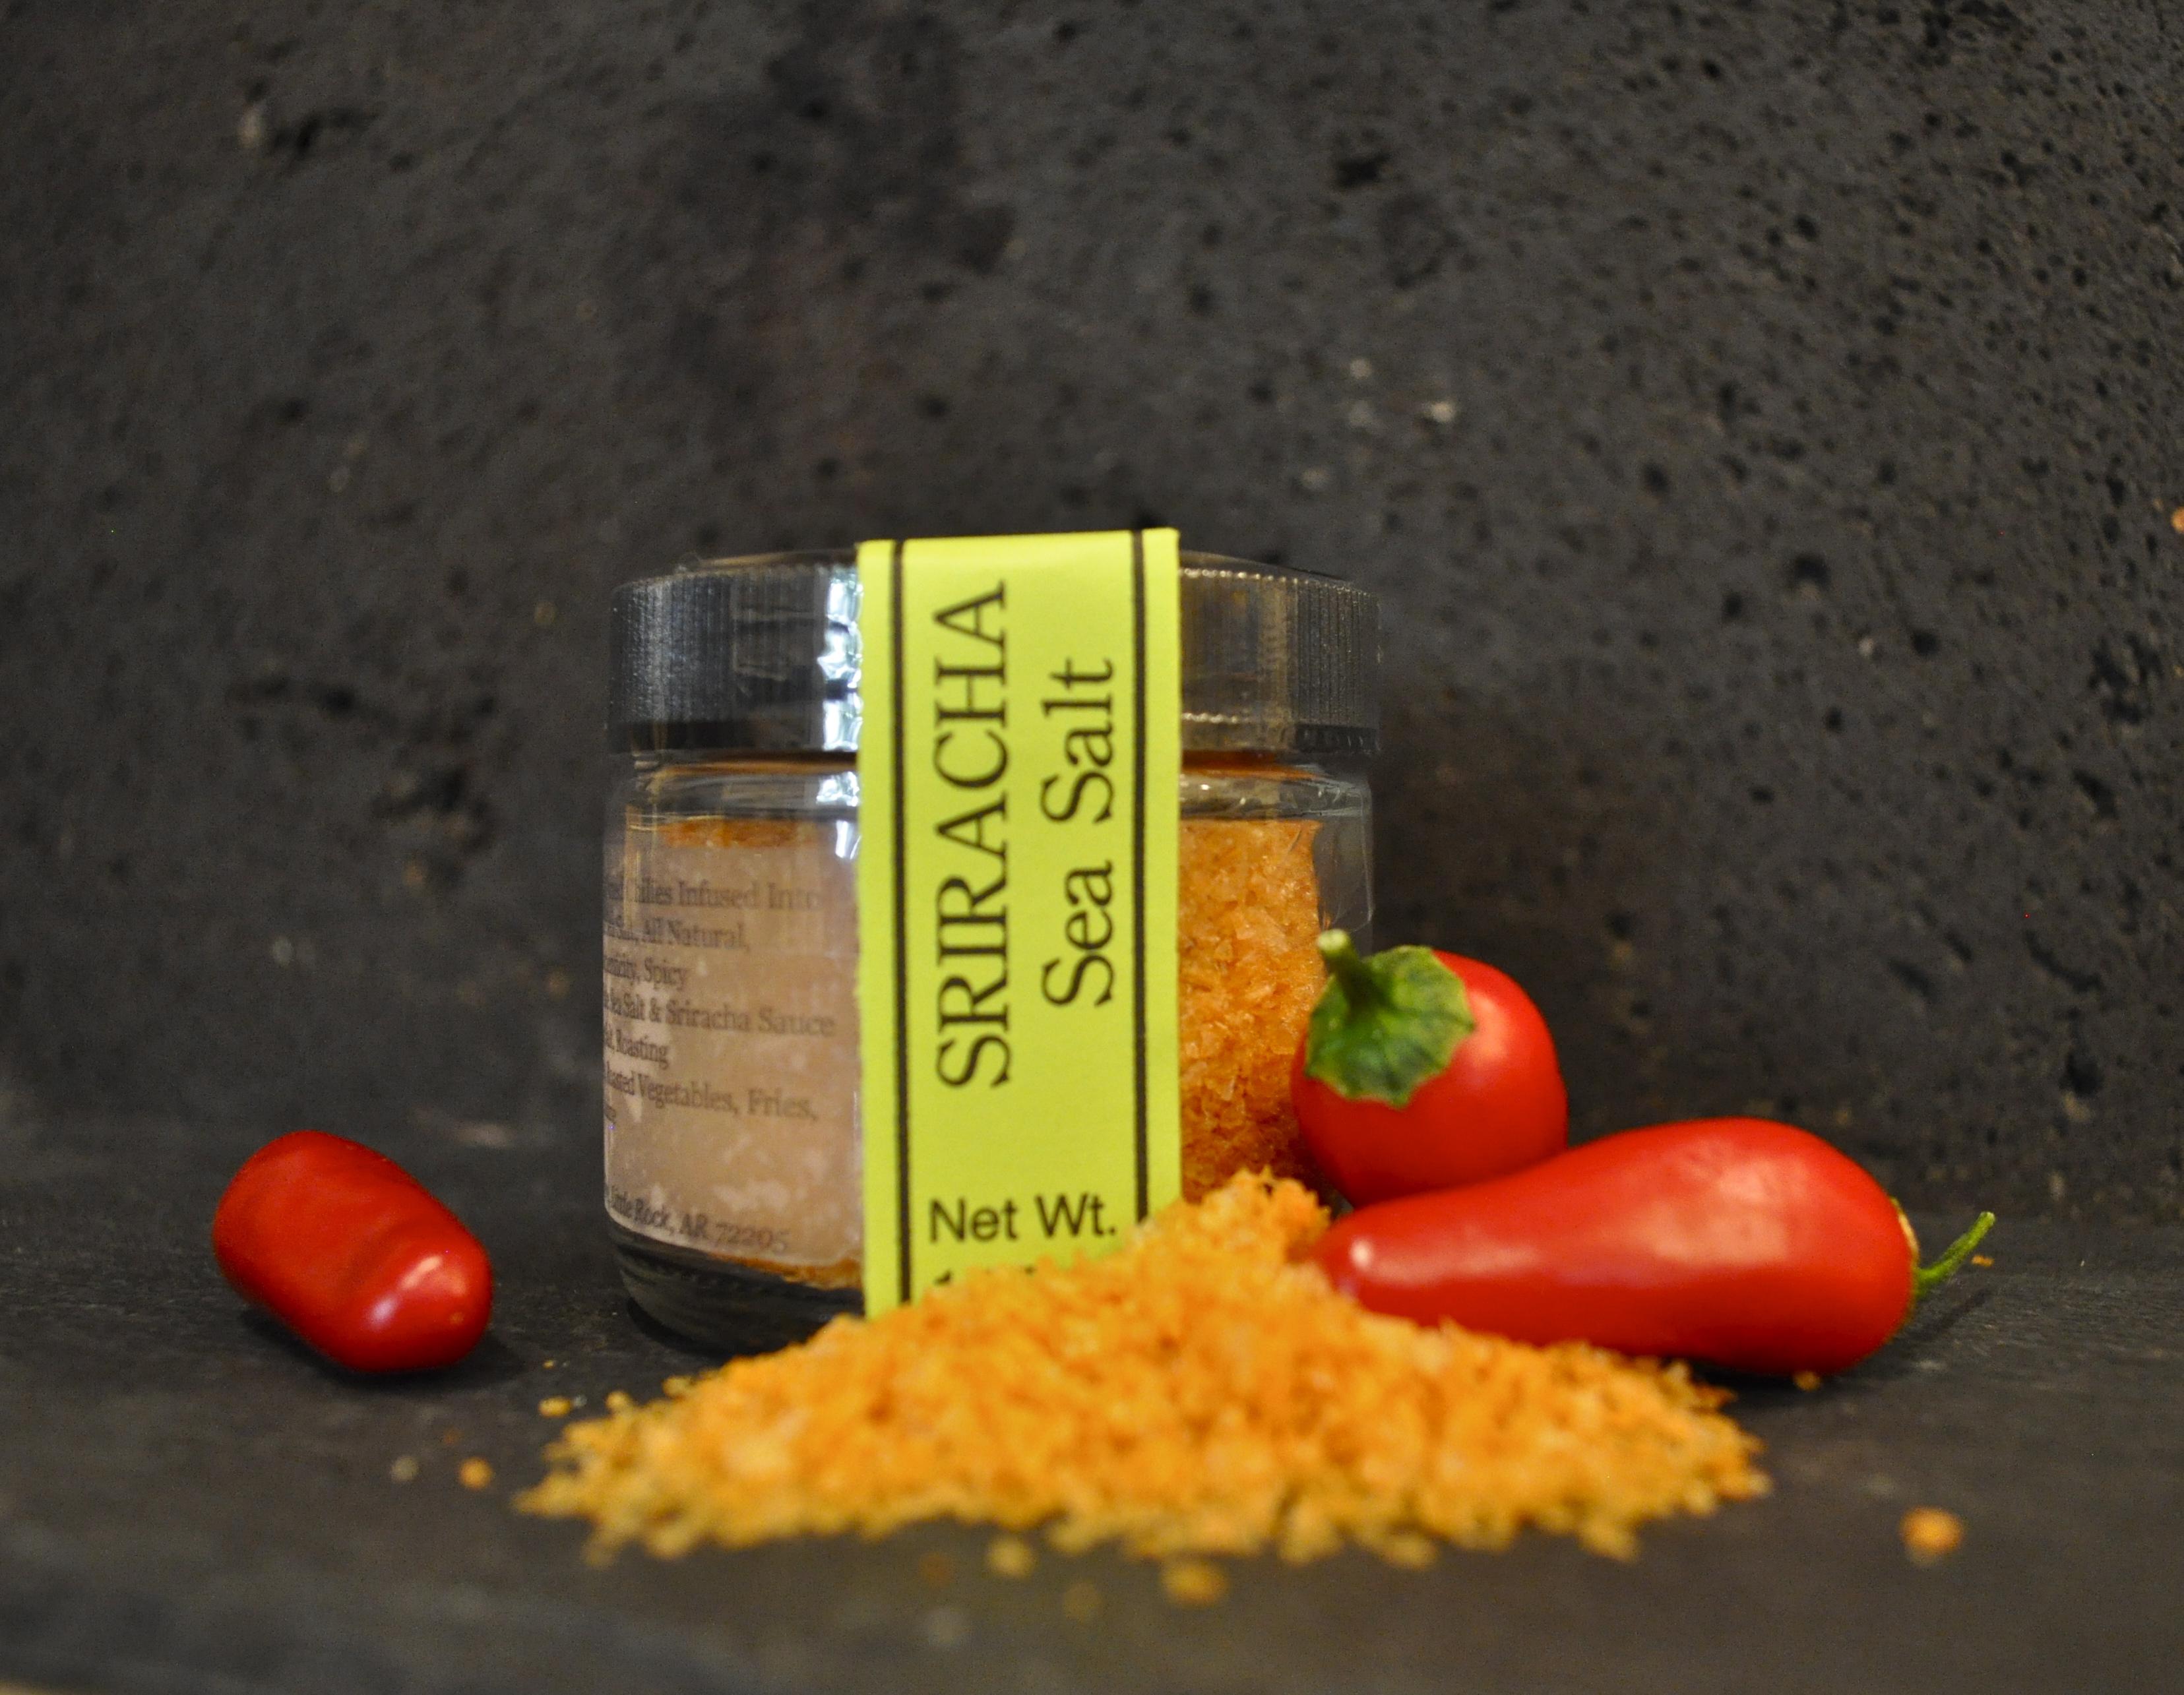 Fennel and Fire Sriracha Sea Salt